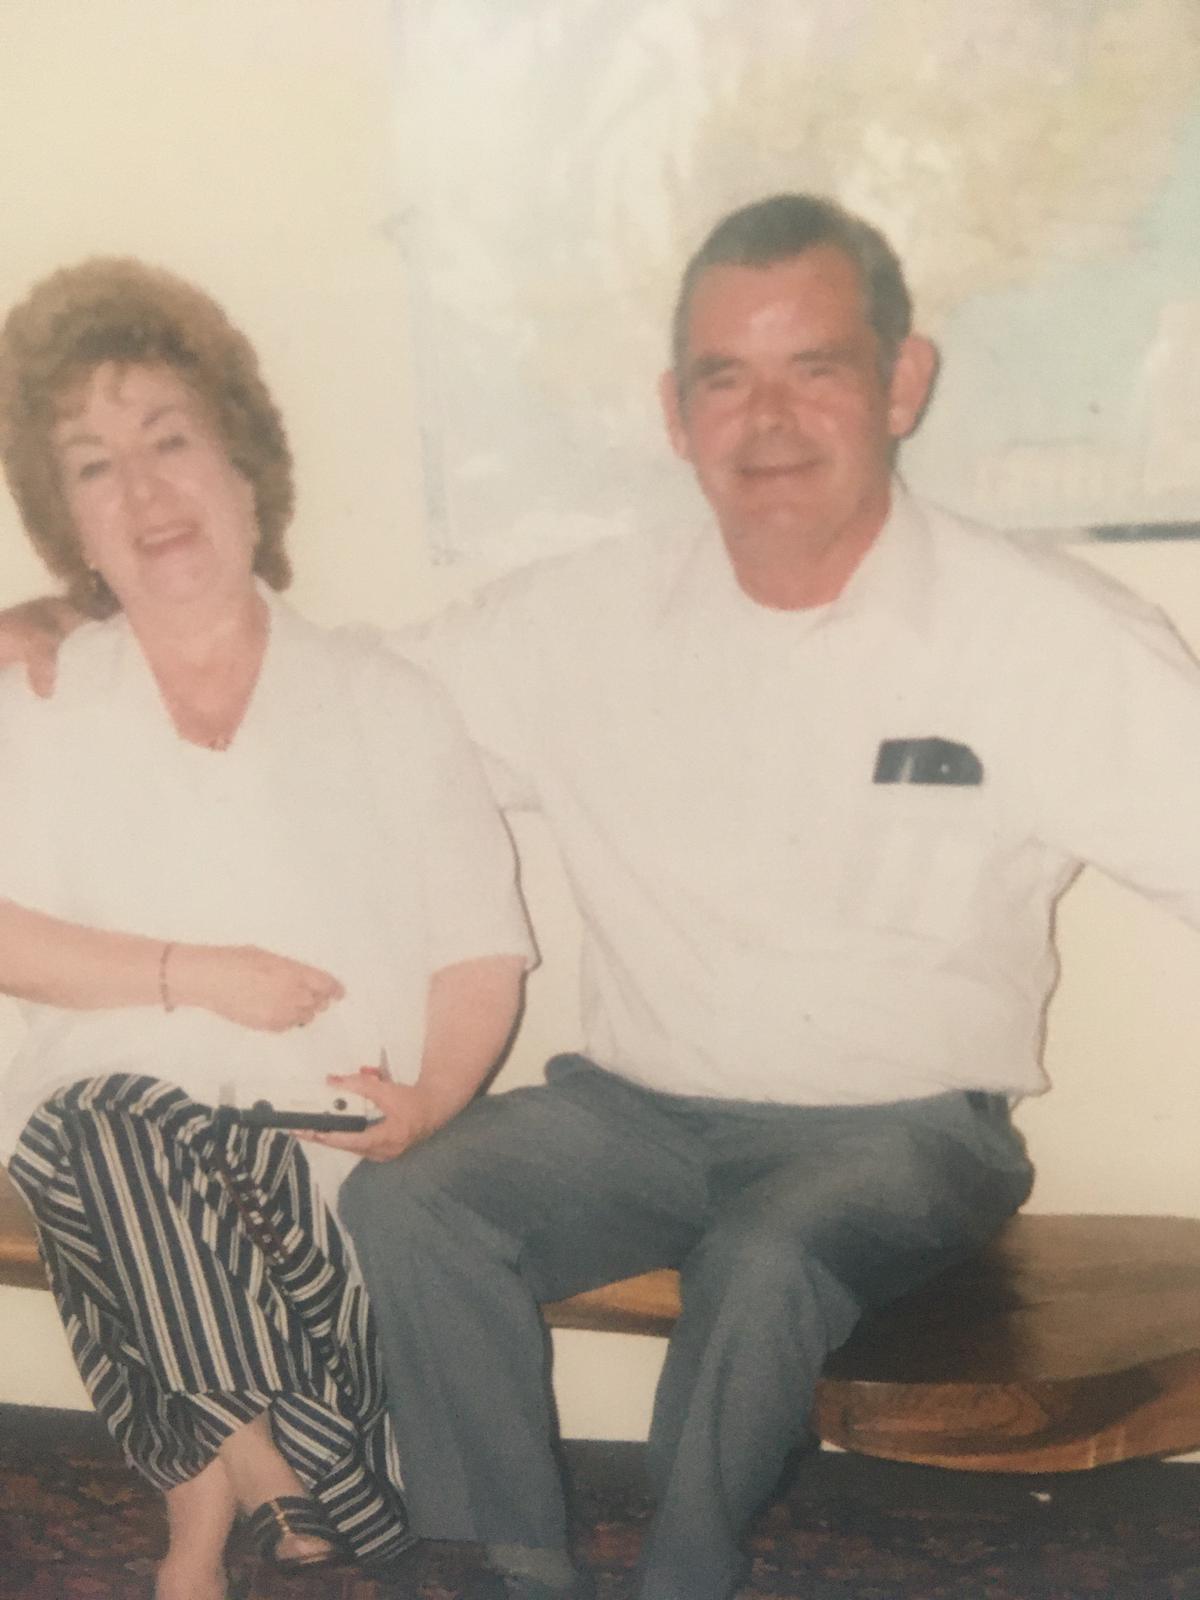 TOGETHER: Geordie and his wife Kathleen